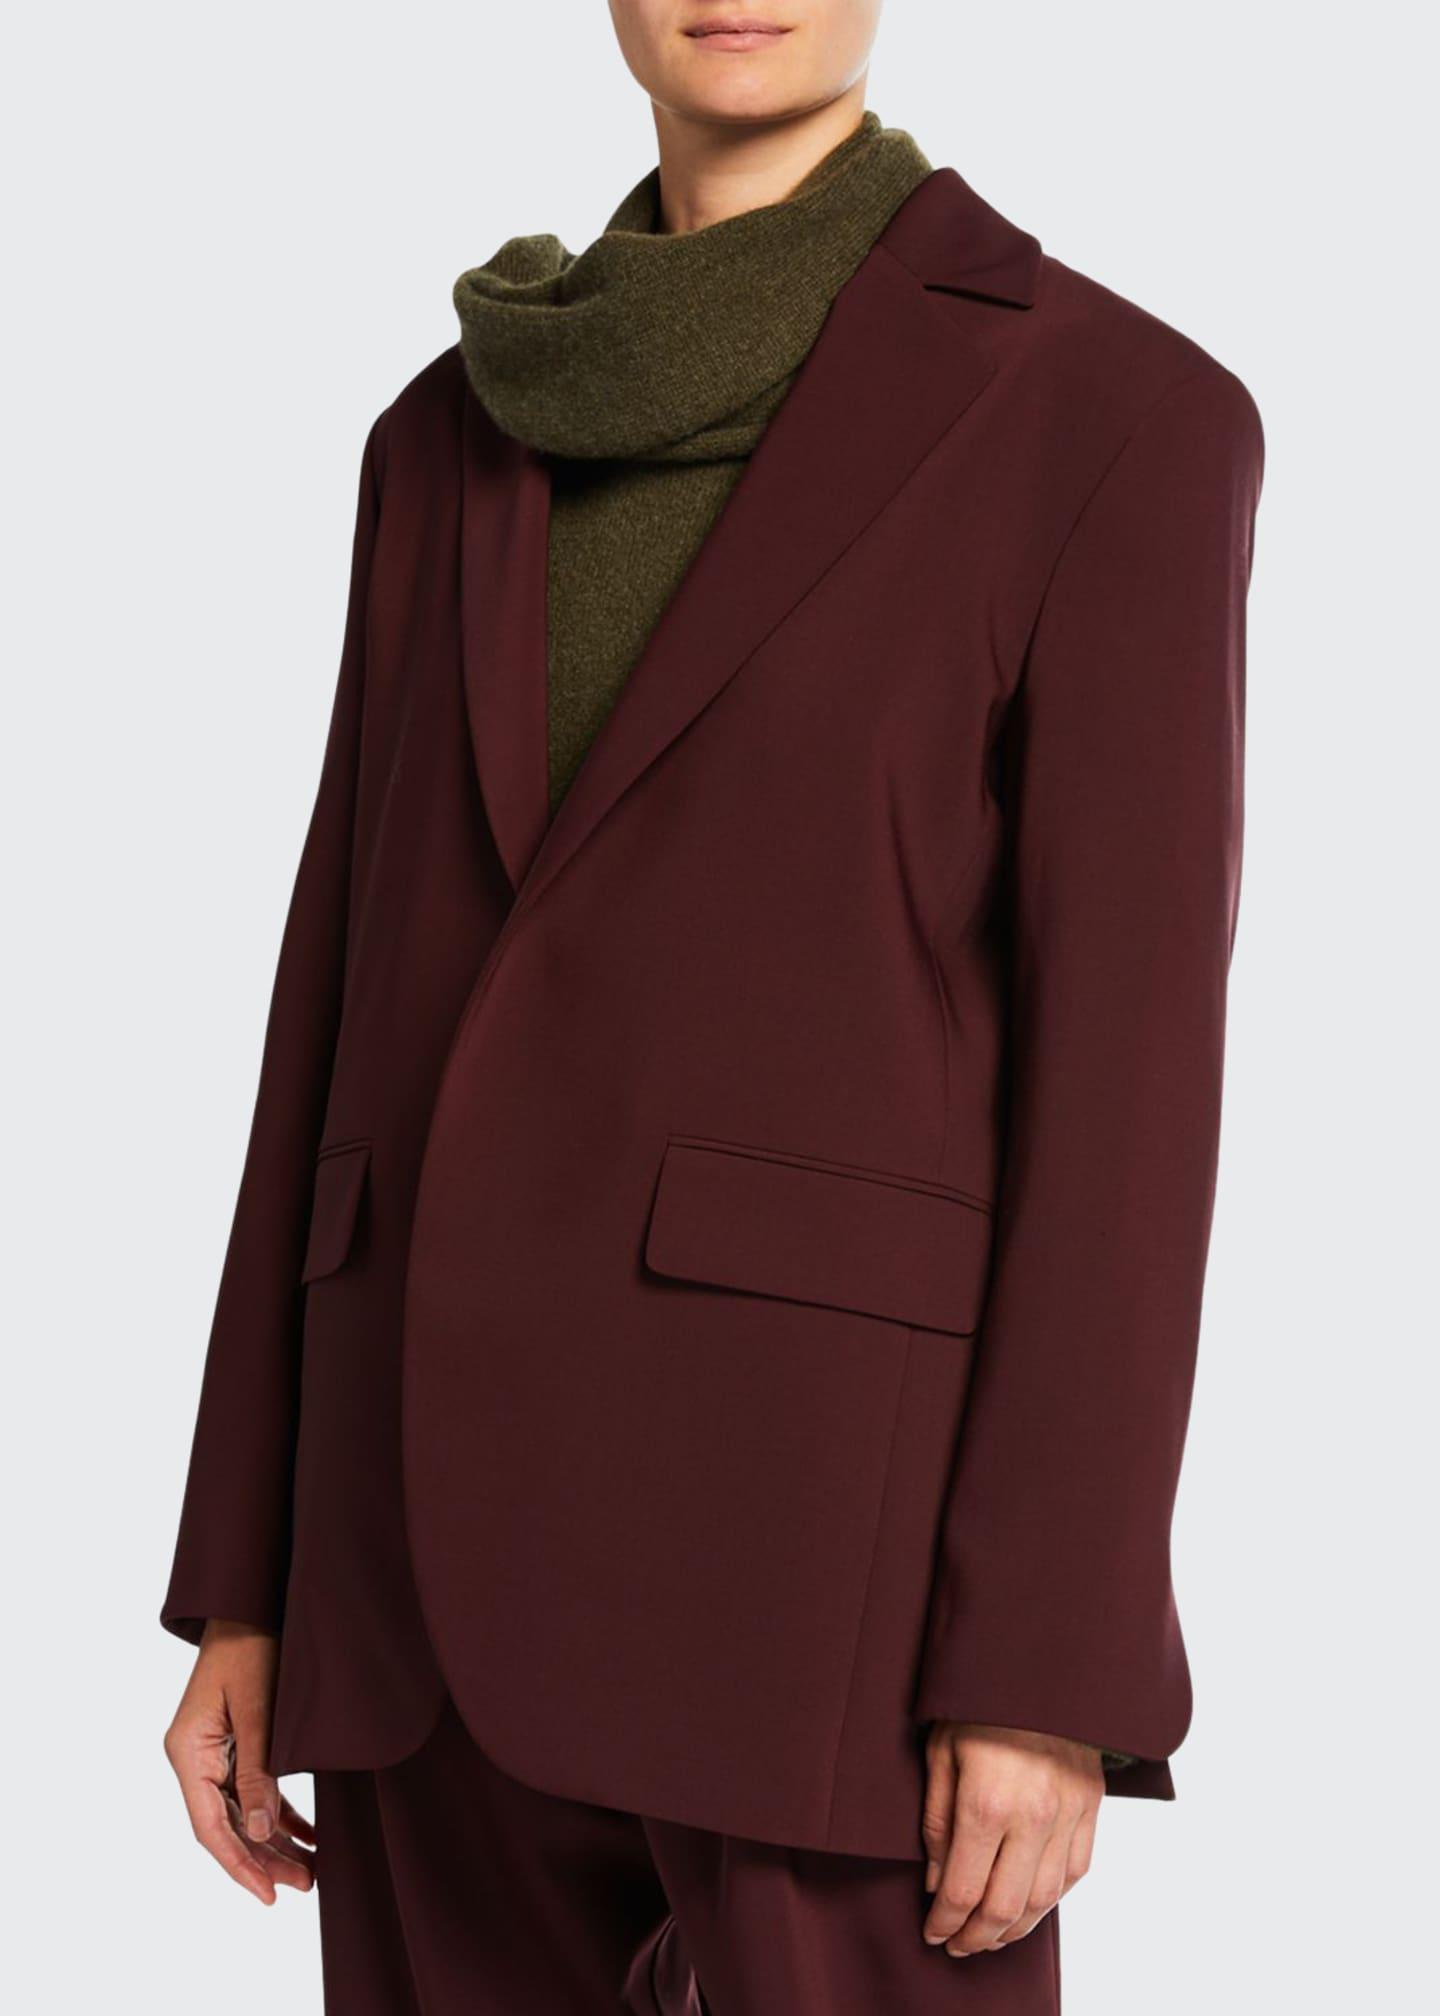 Deveaux New York Elongated Bonded Wool Jacket